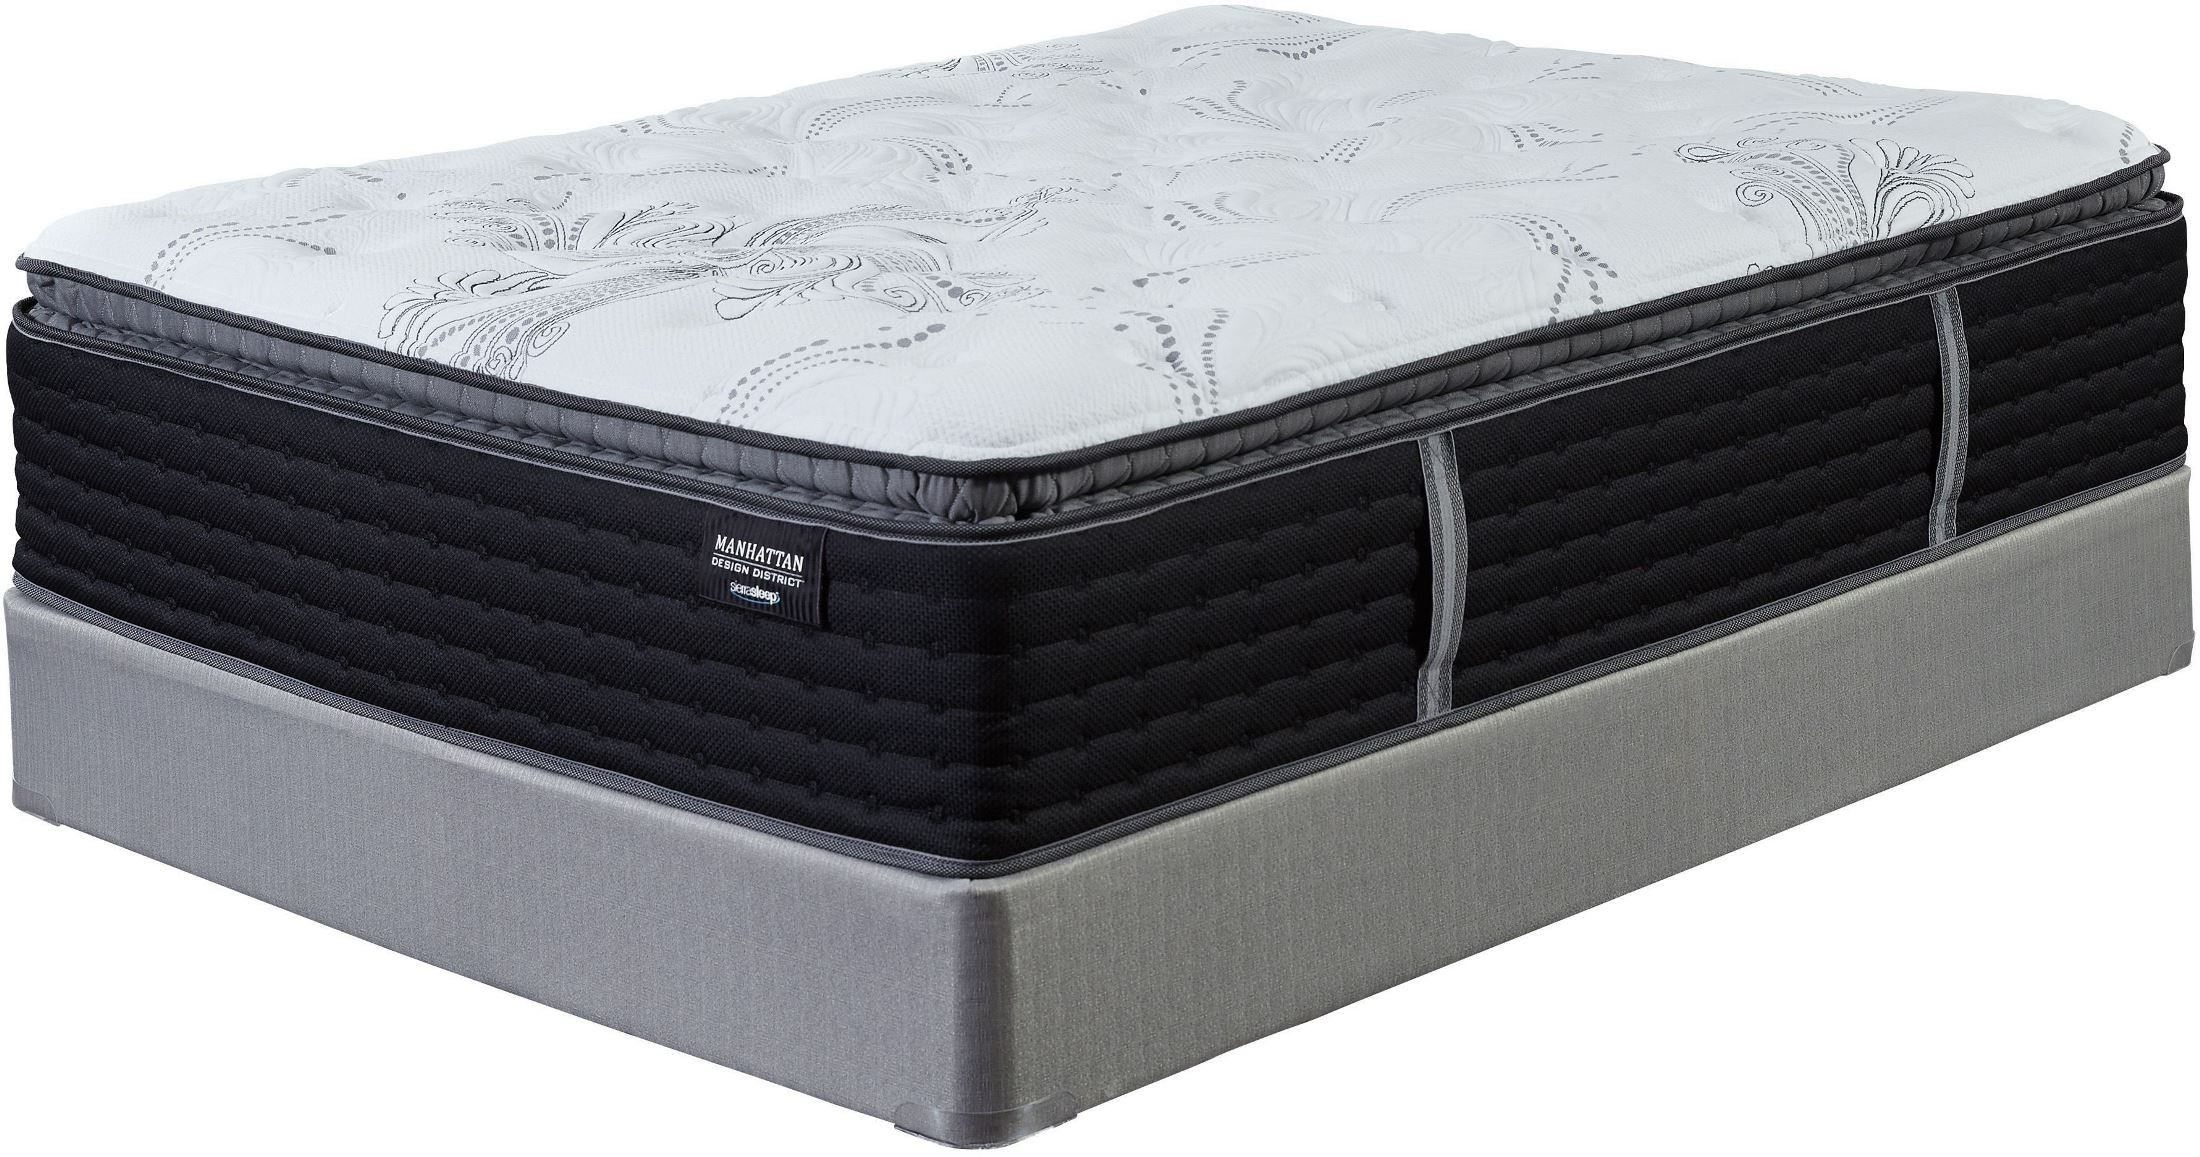 Manhattan Design District Firm Pillow Top White Cal King Mattress From Ashley Coleman Furniture